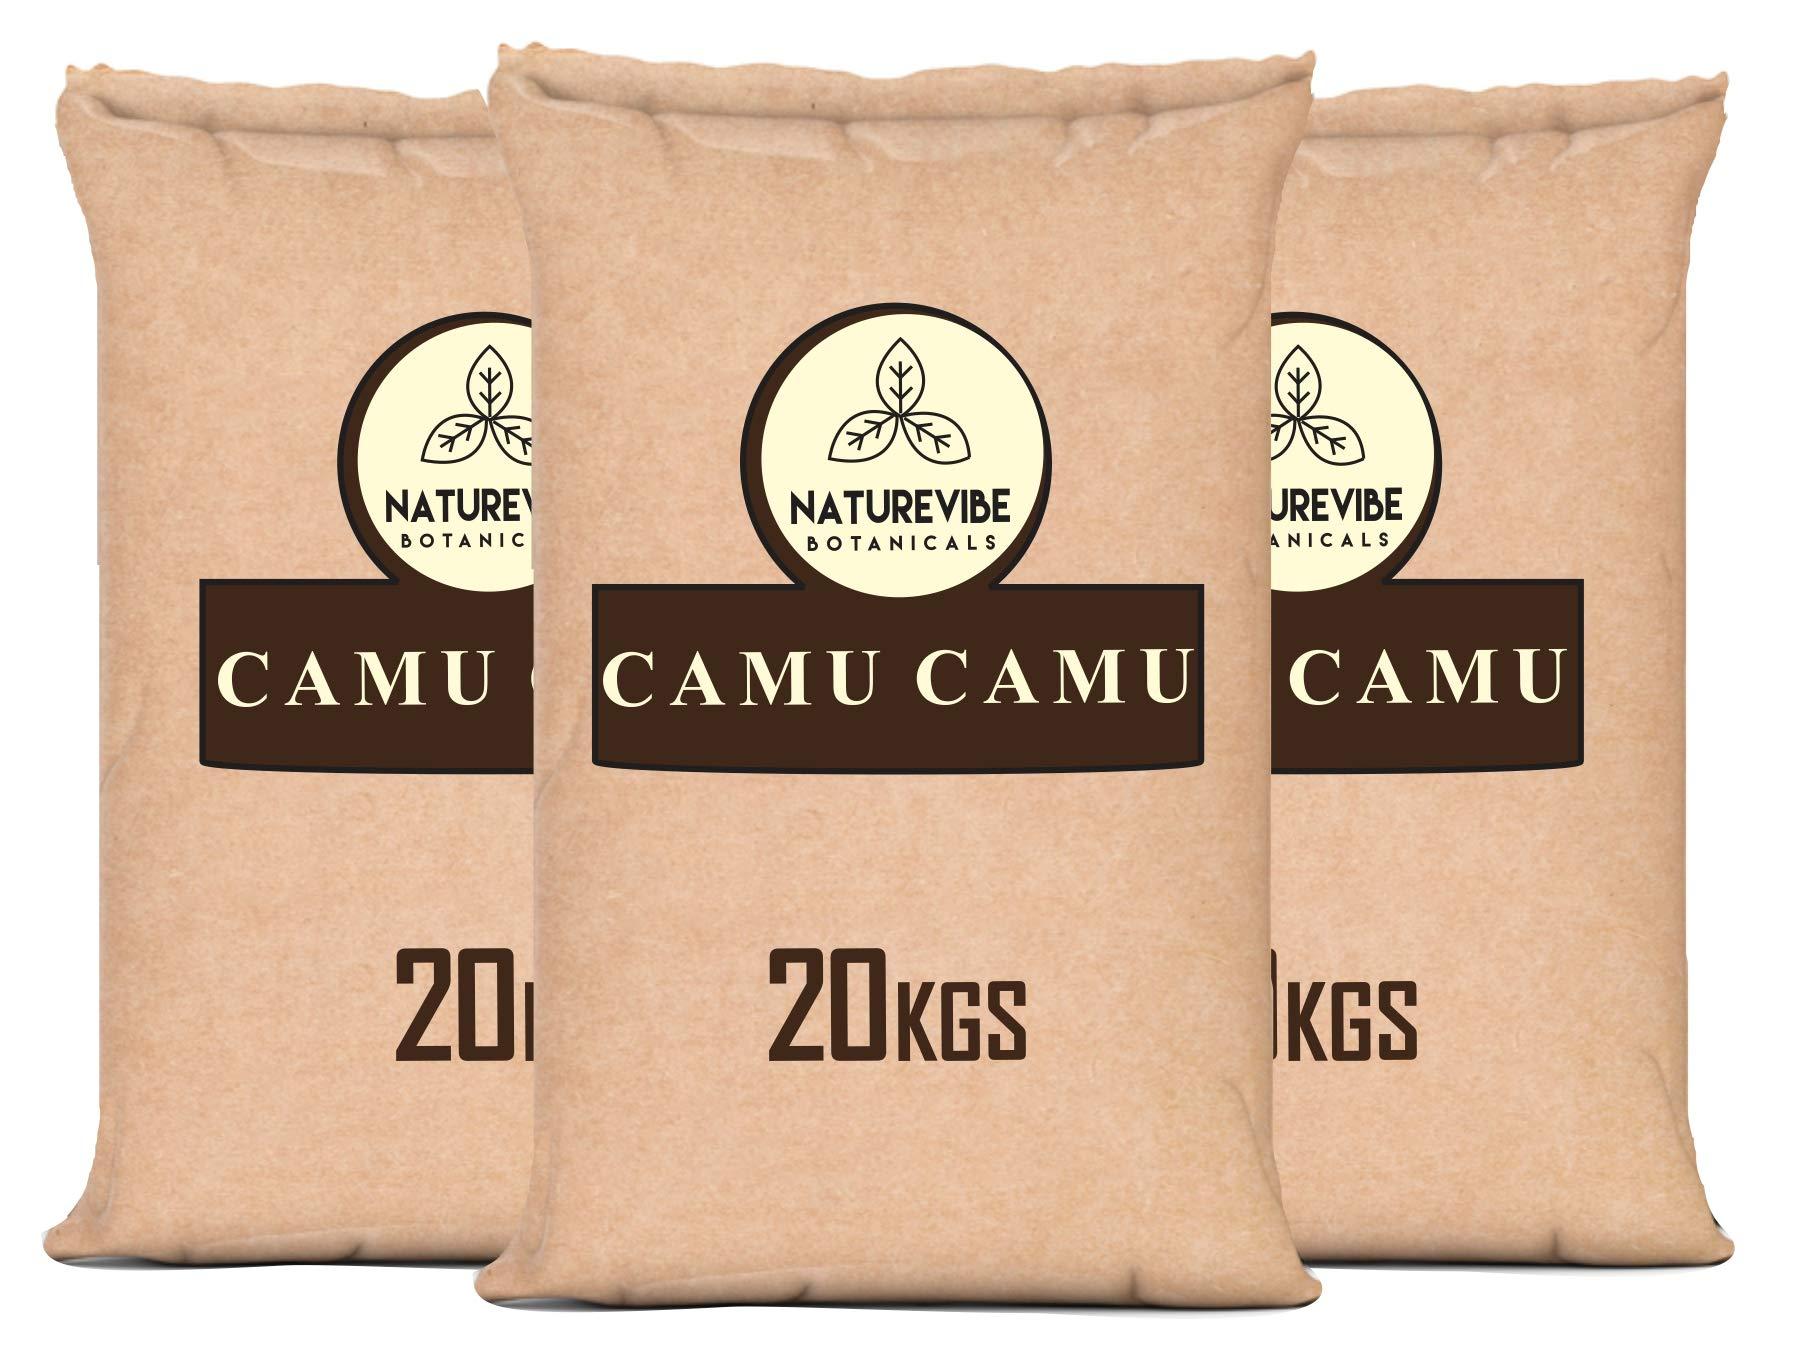 Naturevibe Botanicals Organic Camu Camu Powder 44 lbs, 20 kg Paper Bulk Bag …